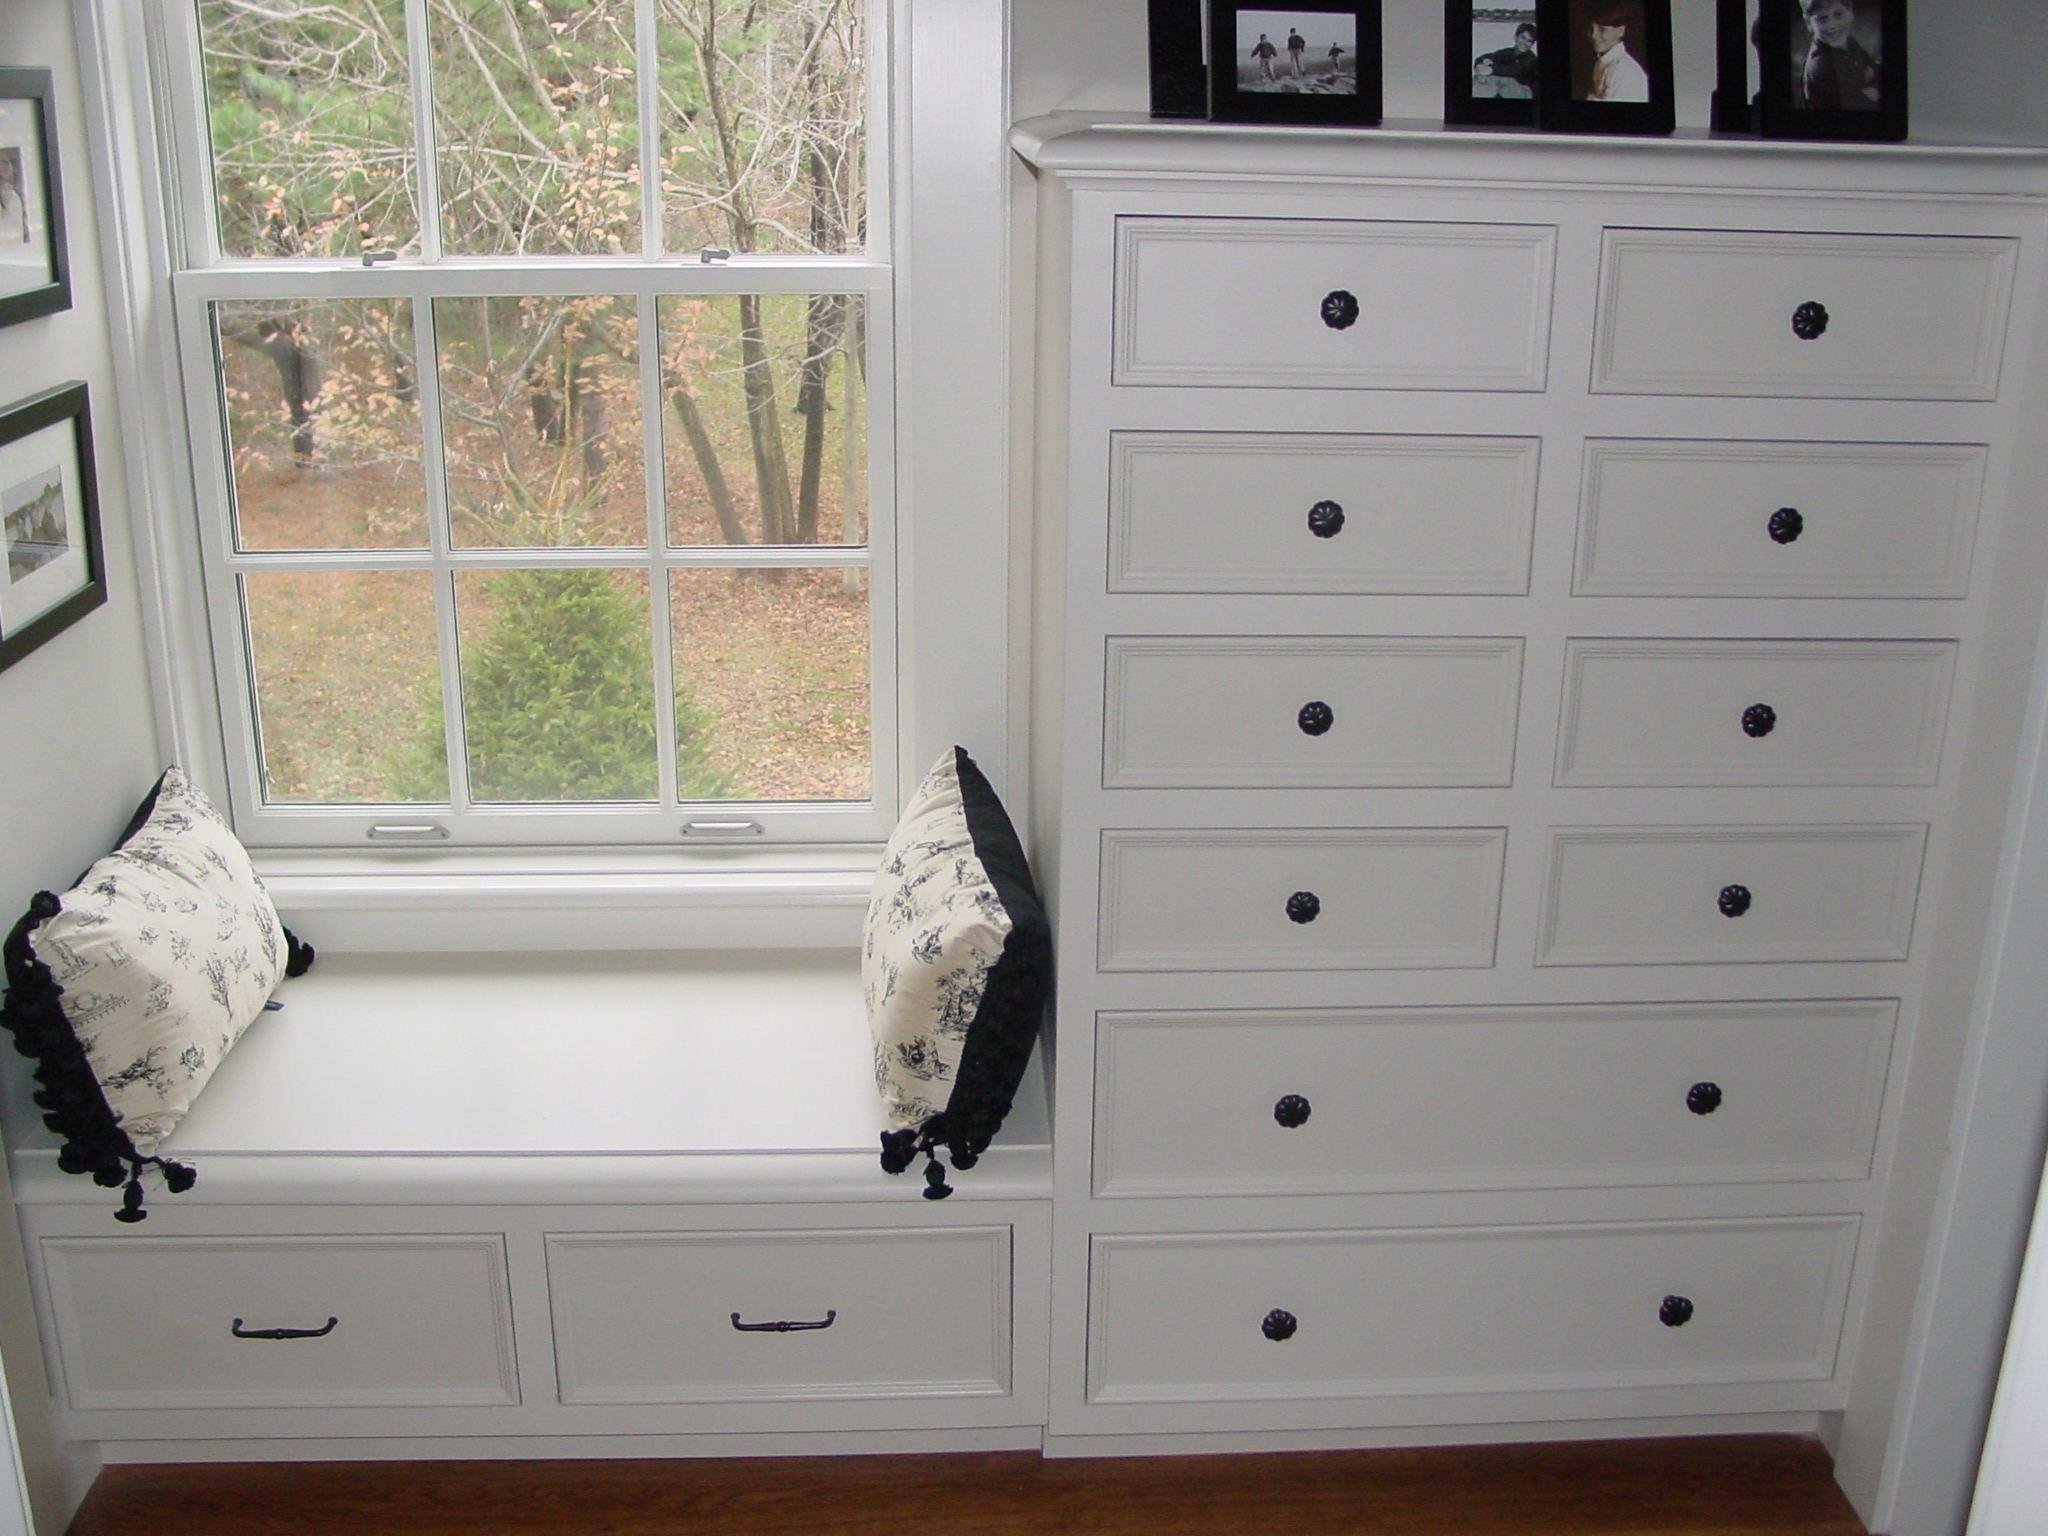 Builtin dresser with window seat bedroom built ins